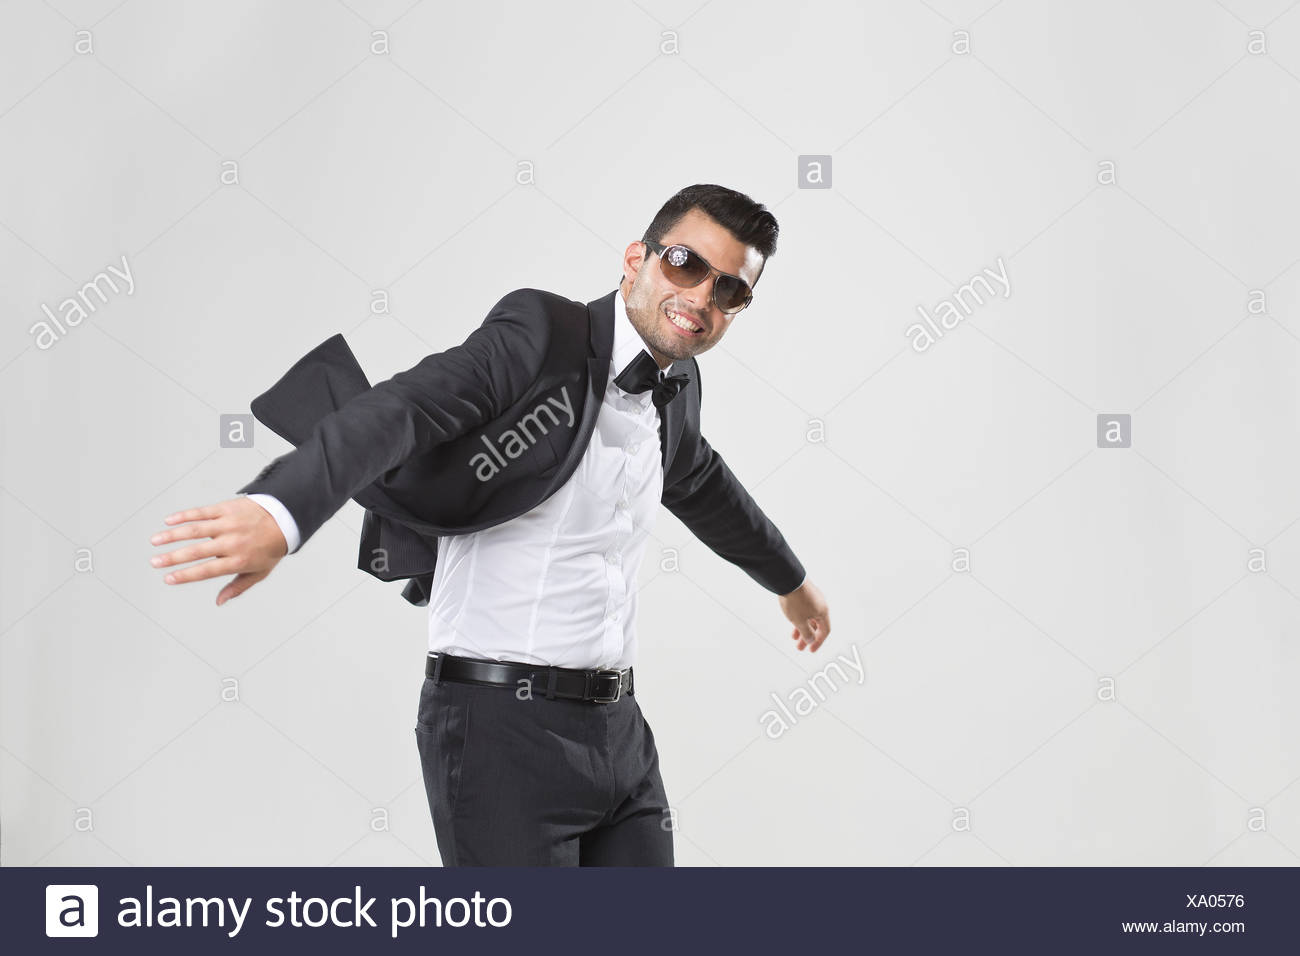 Smiling man in tuxedo dancing - Stock Image